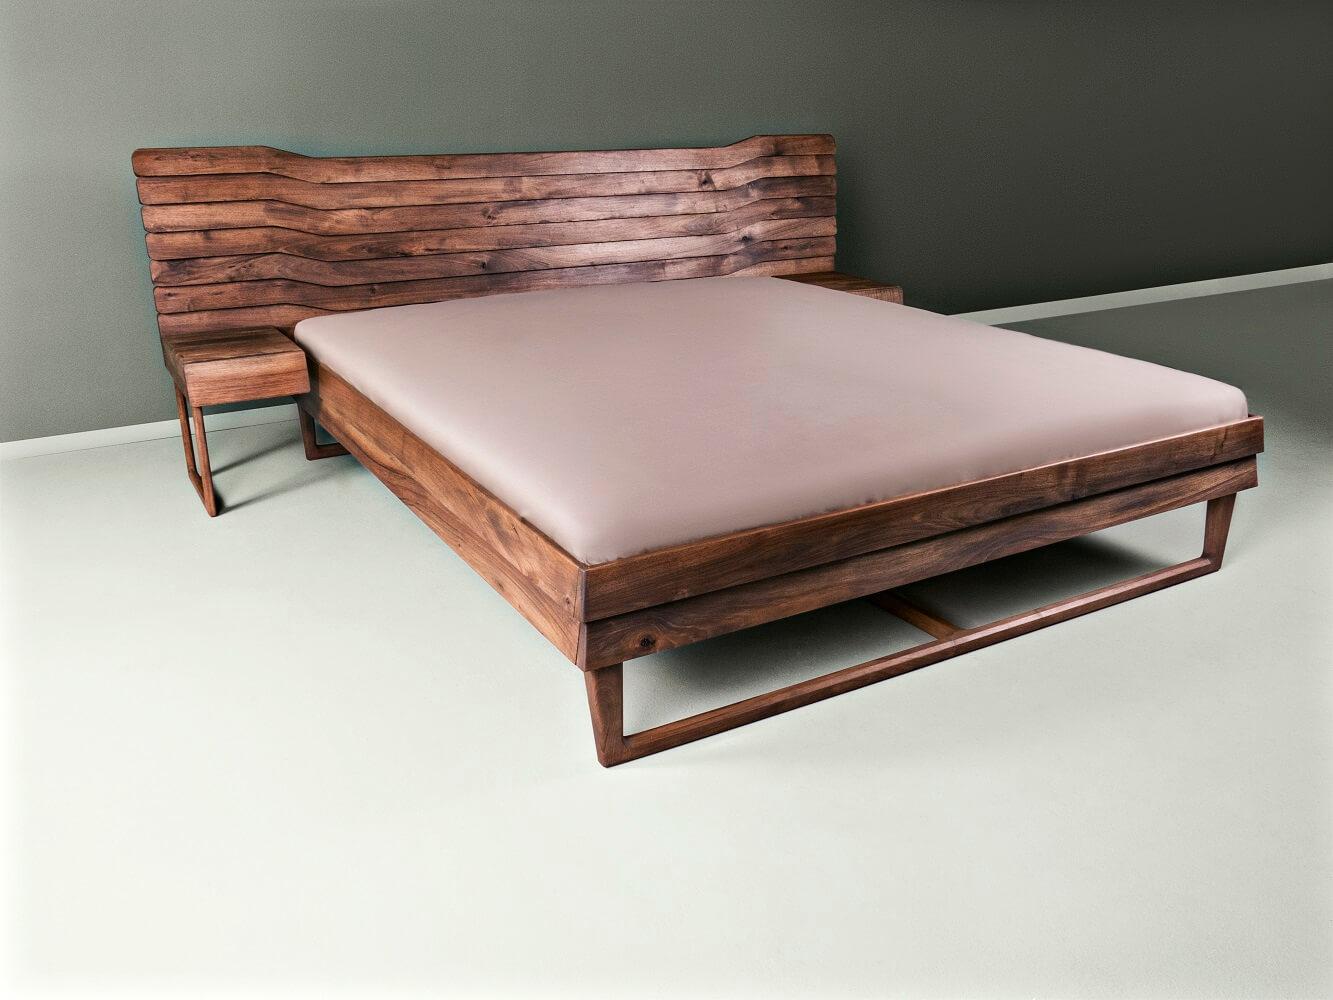 walnut double bed - Talas